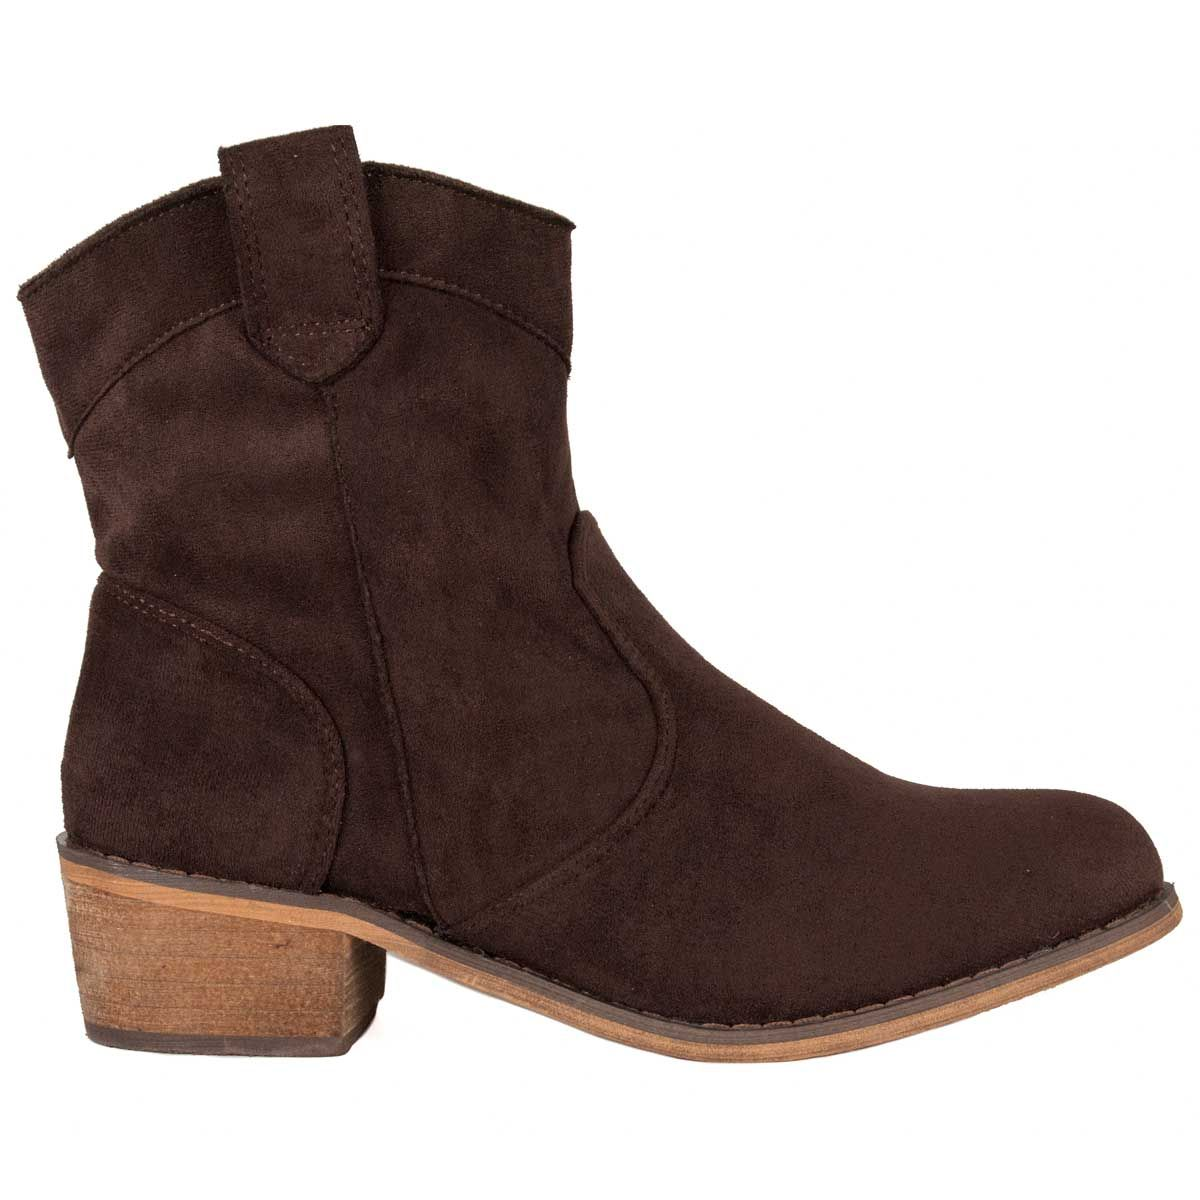 Montevita Flat Western Ankle Boot in Brown